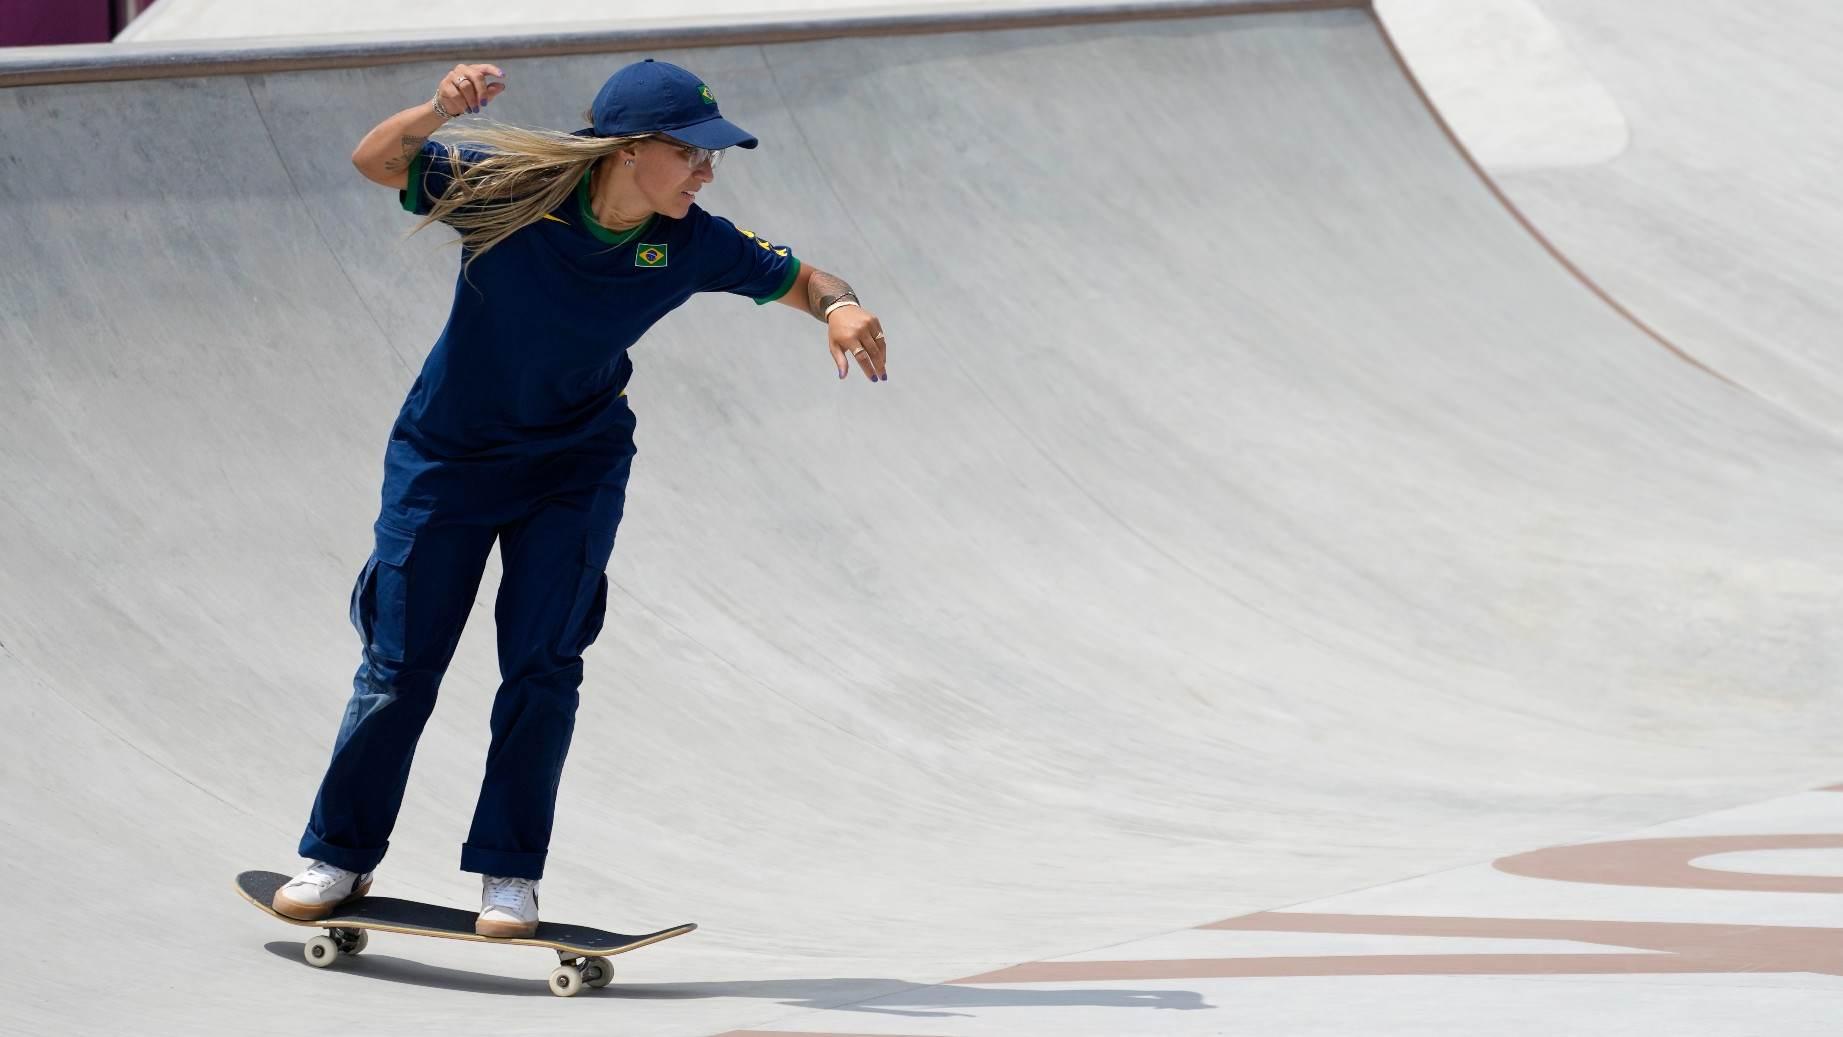 Pamela Rosa, brasileira do skate, nas Olimpíadas